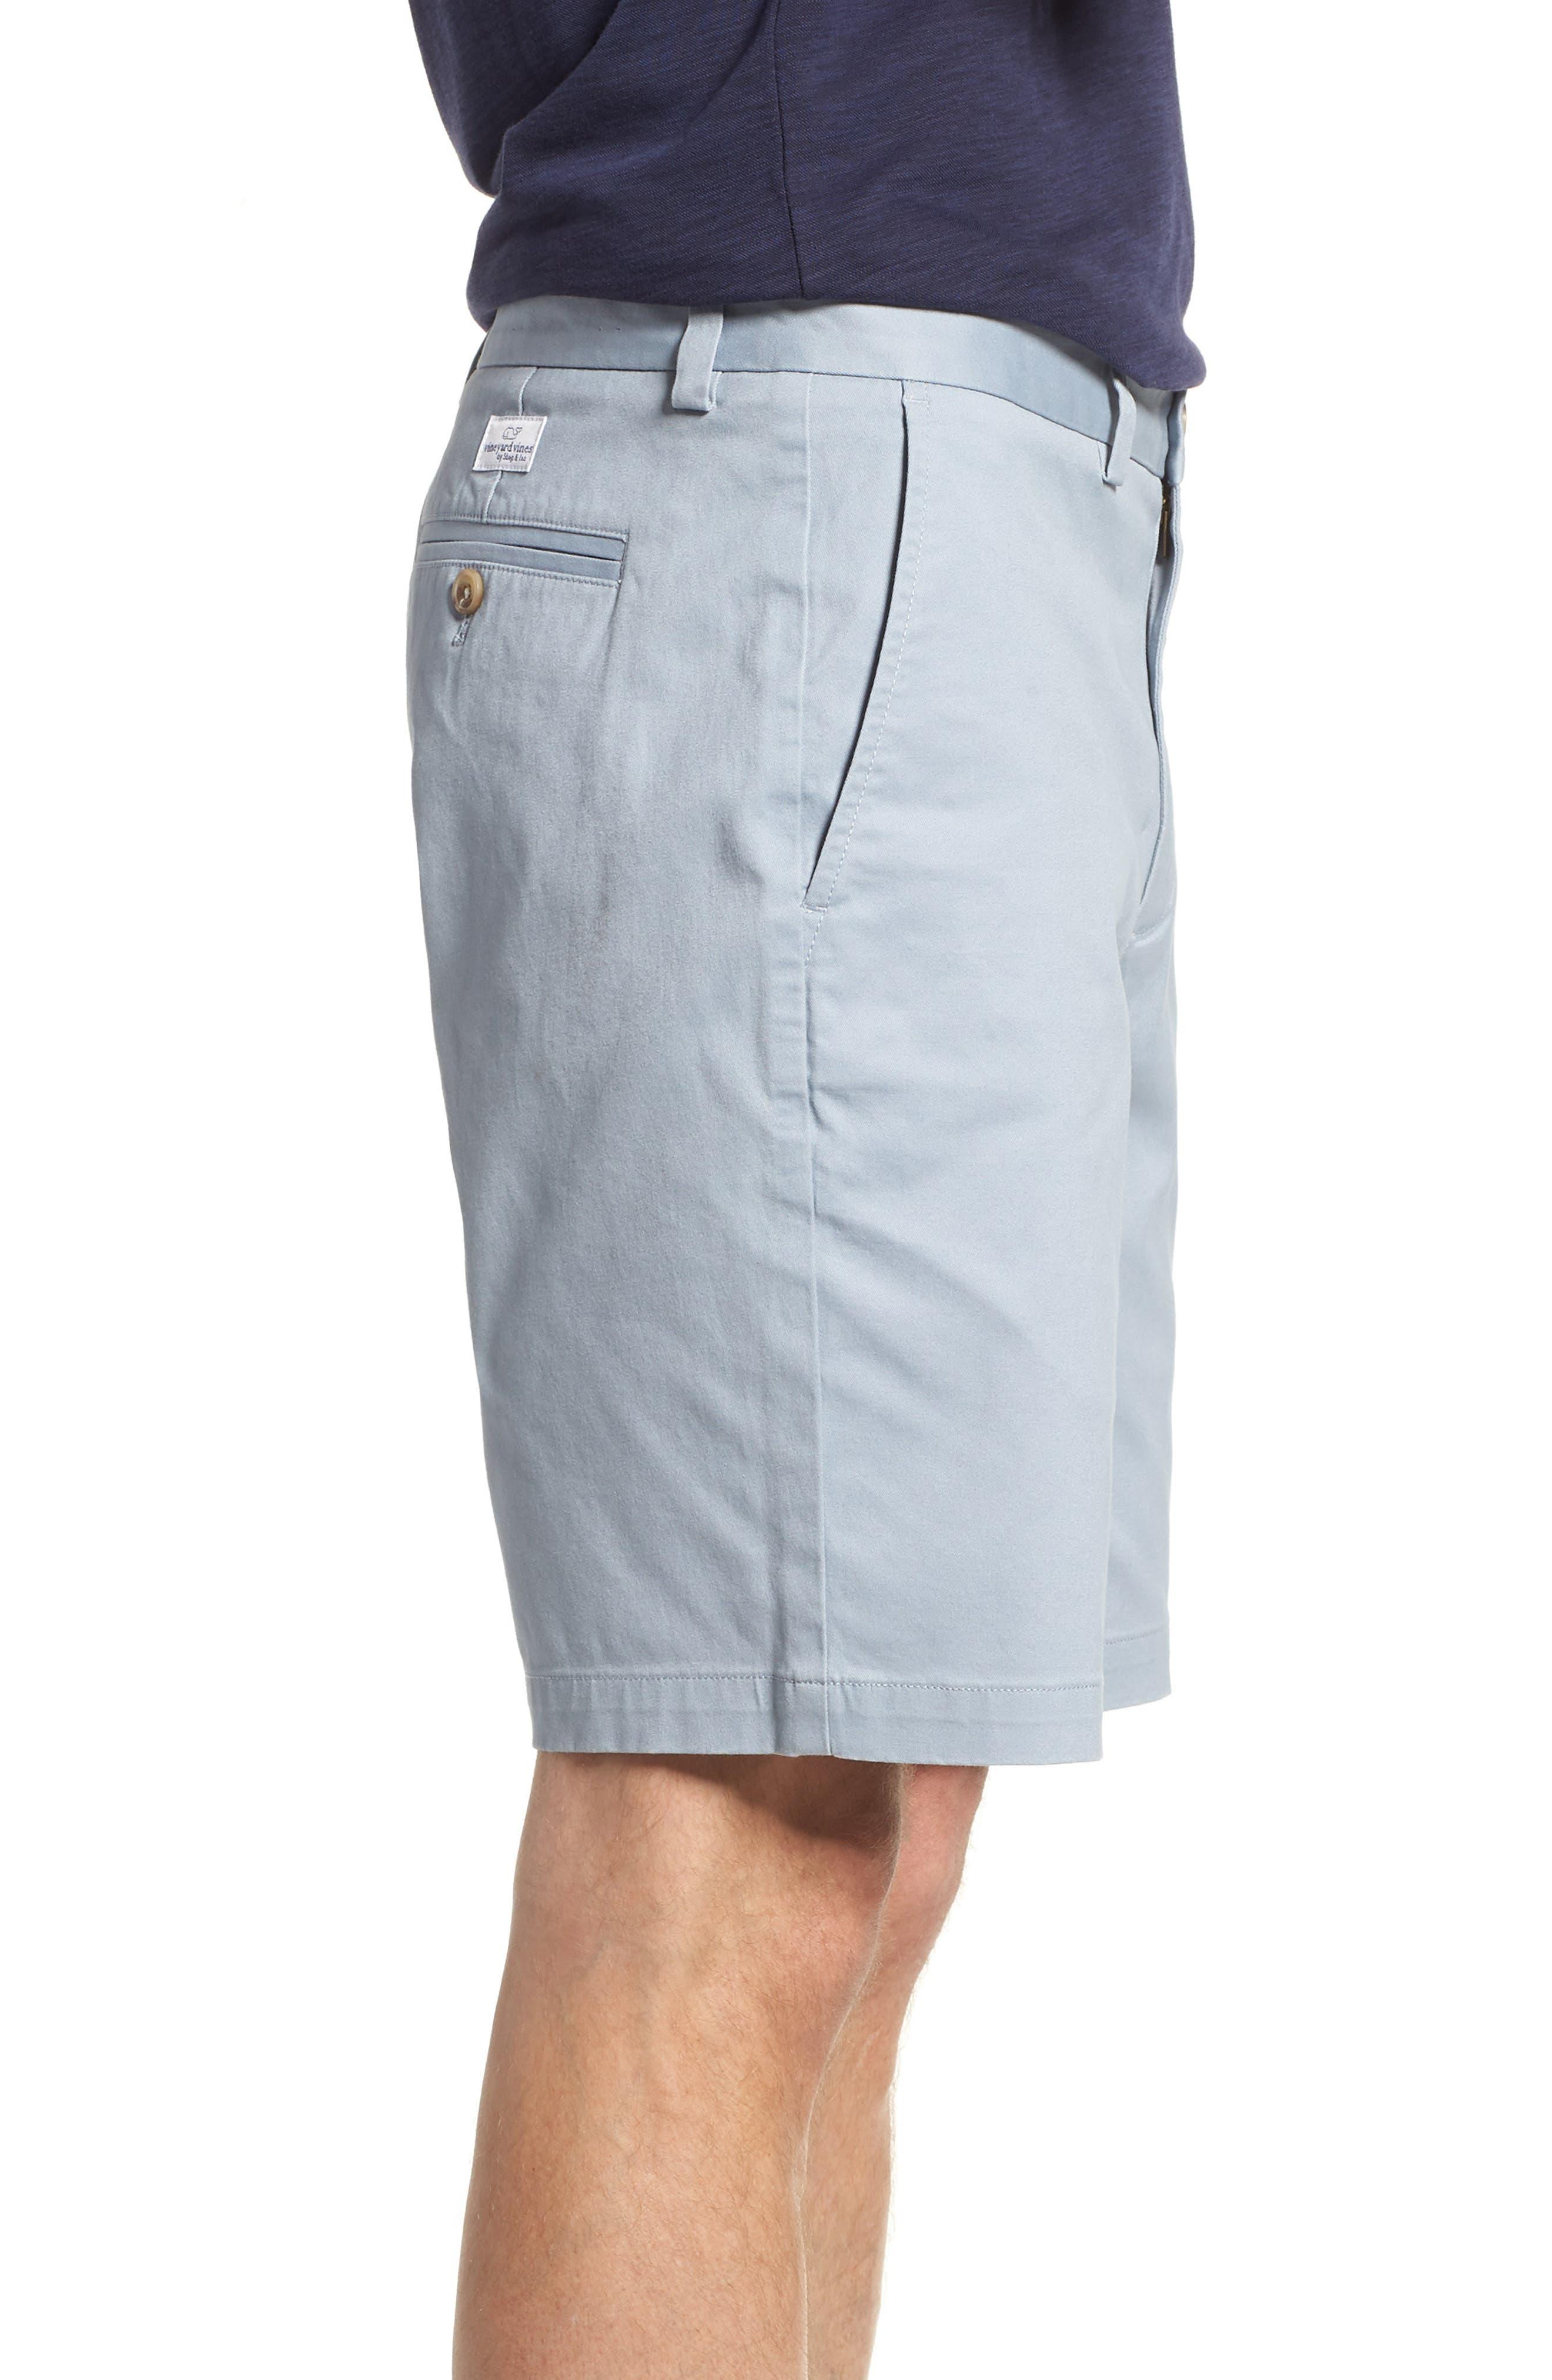 9 Inch Stretch Breaker Shorts,                             Alternate thumbnail 3, color,                             034